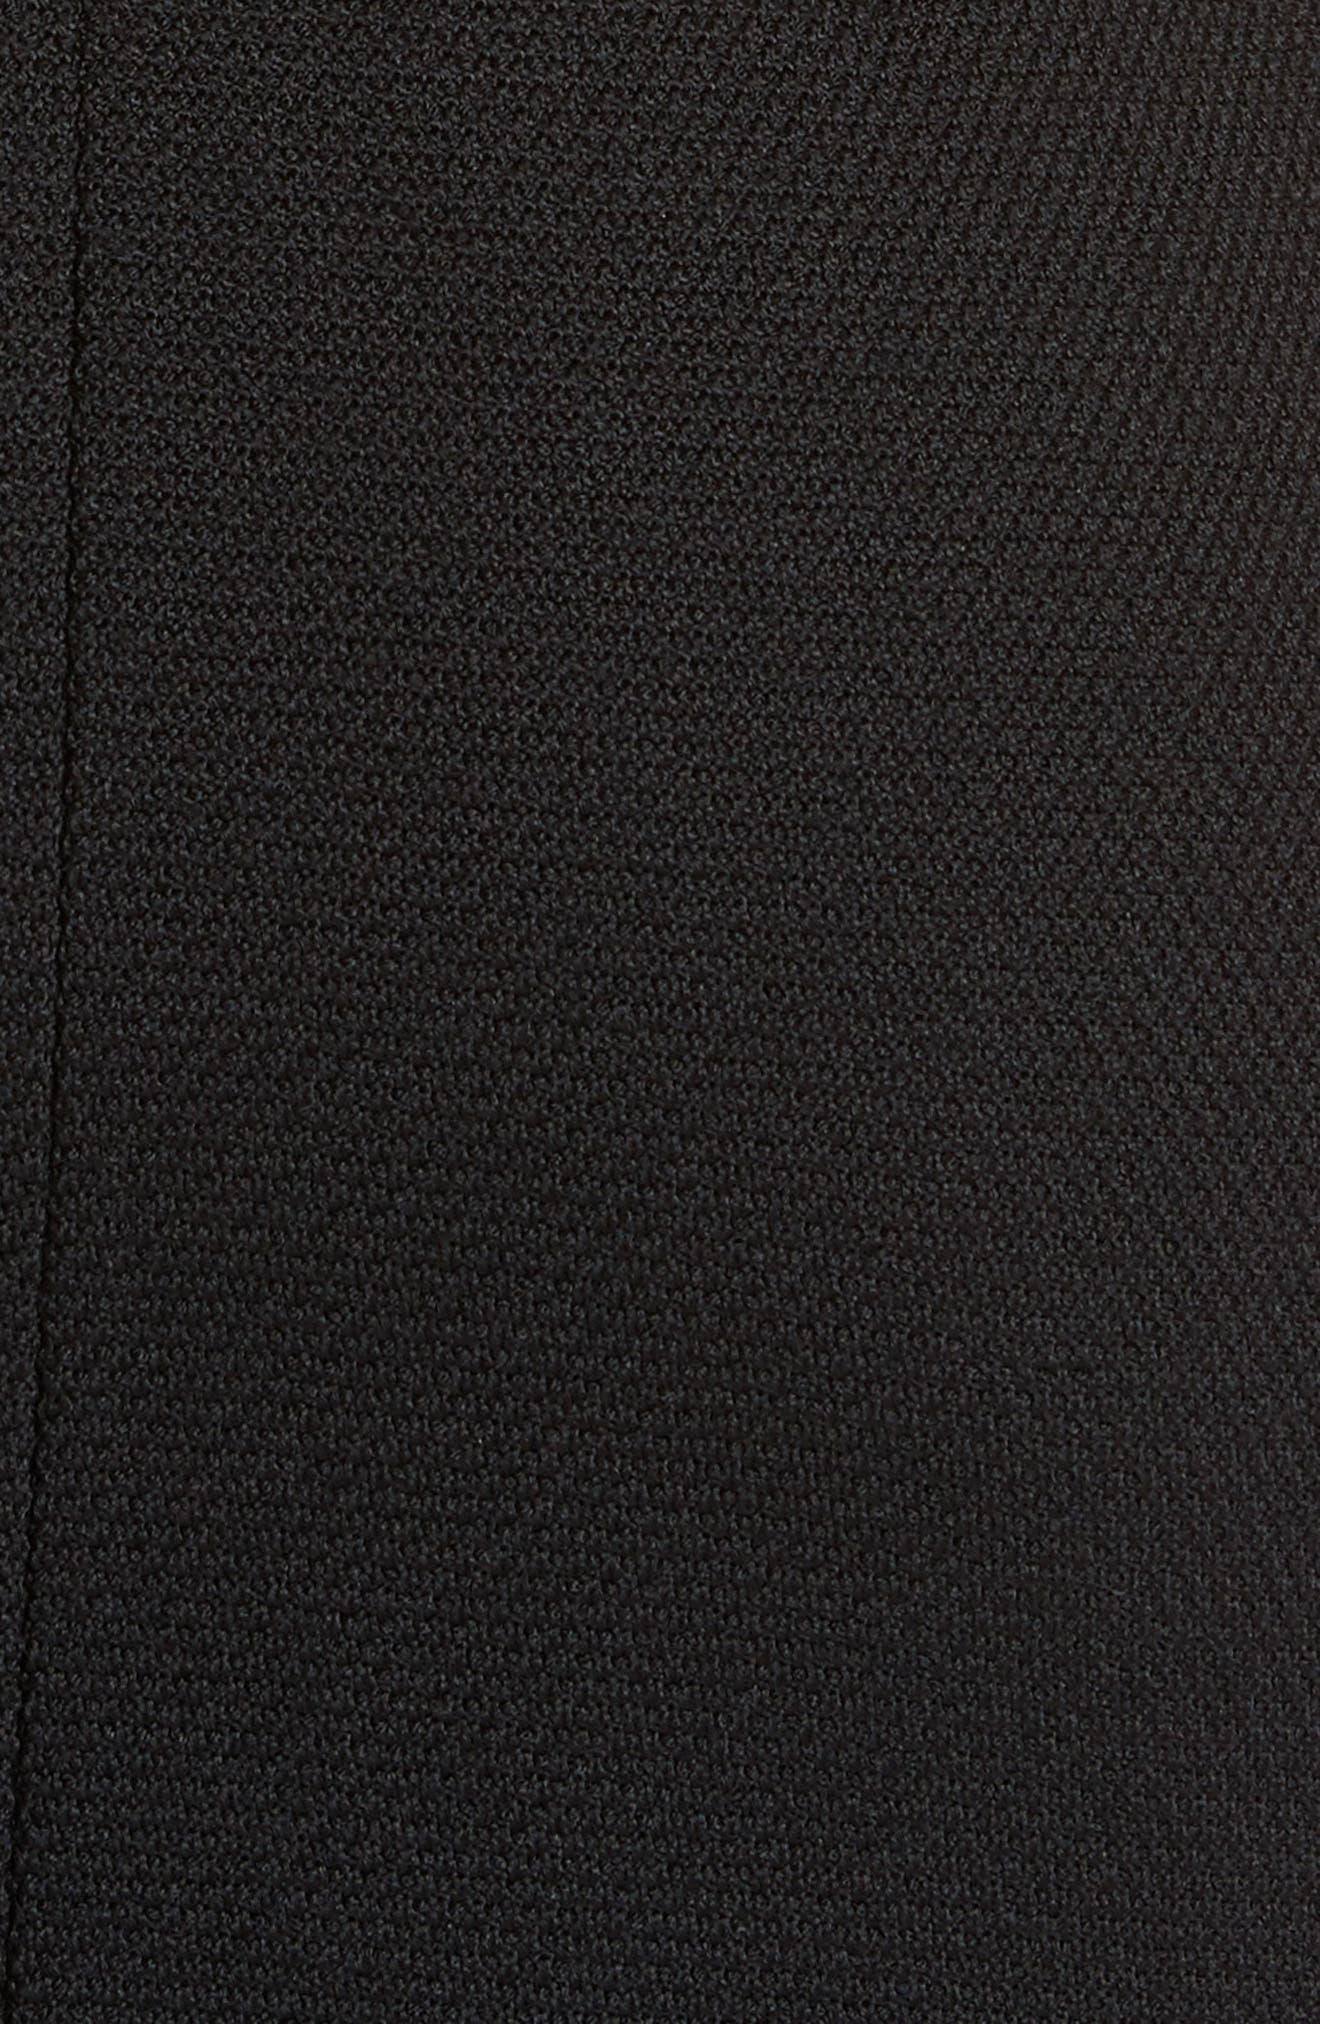 Micro Bouclé Knit Dress,                             Alternate thumbnail 5, color,                             CAVIAR